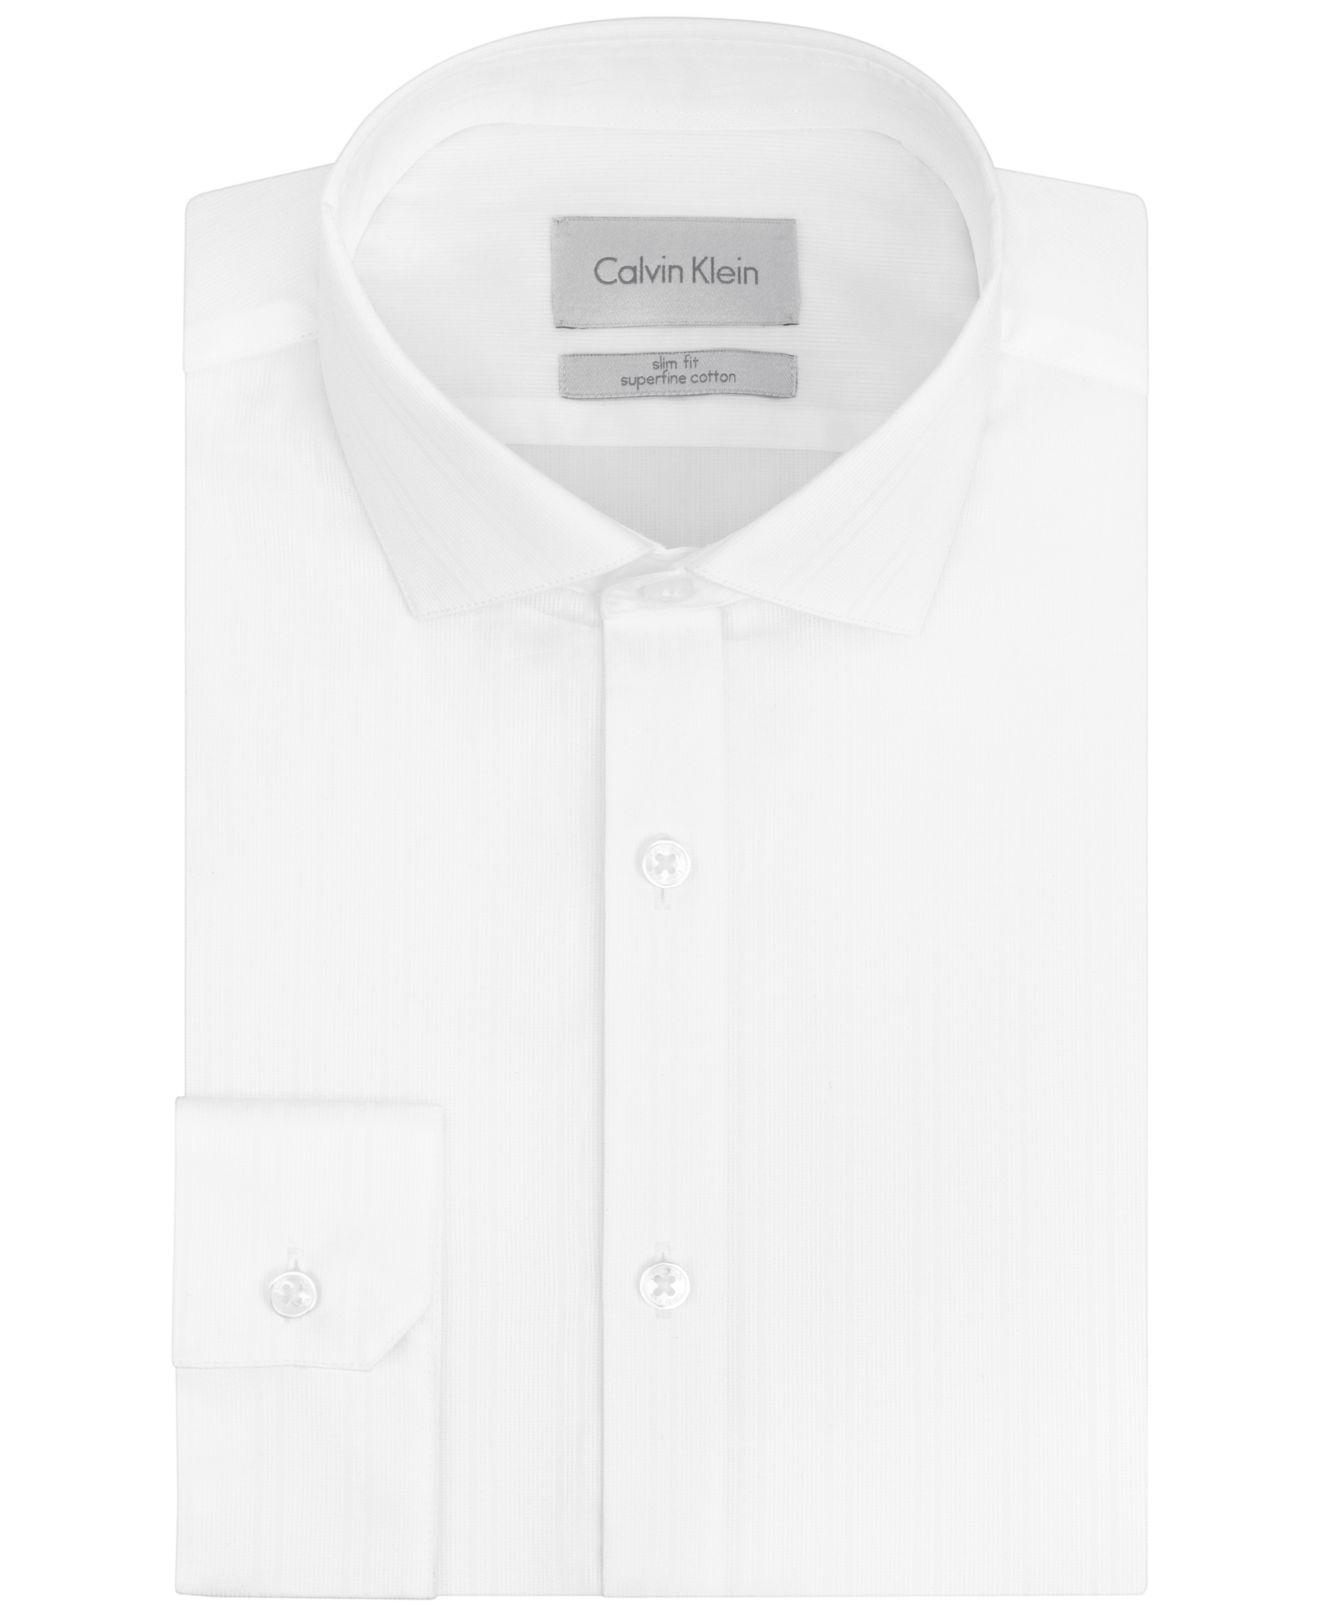 Lyst Calvin Klein Platinum Slim Fit White Tonal Stripe Dress Shirt